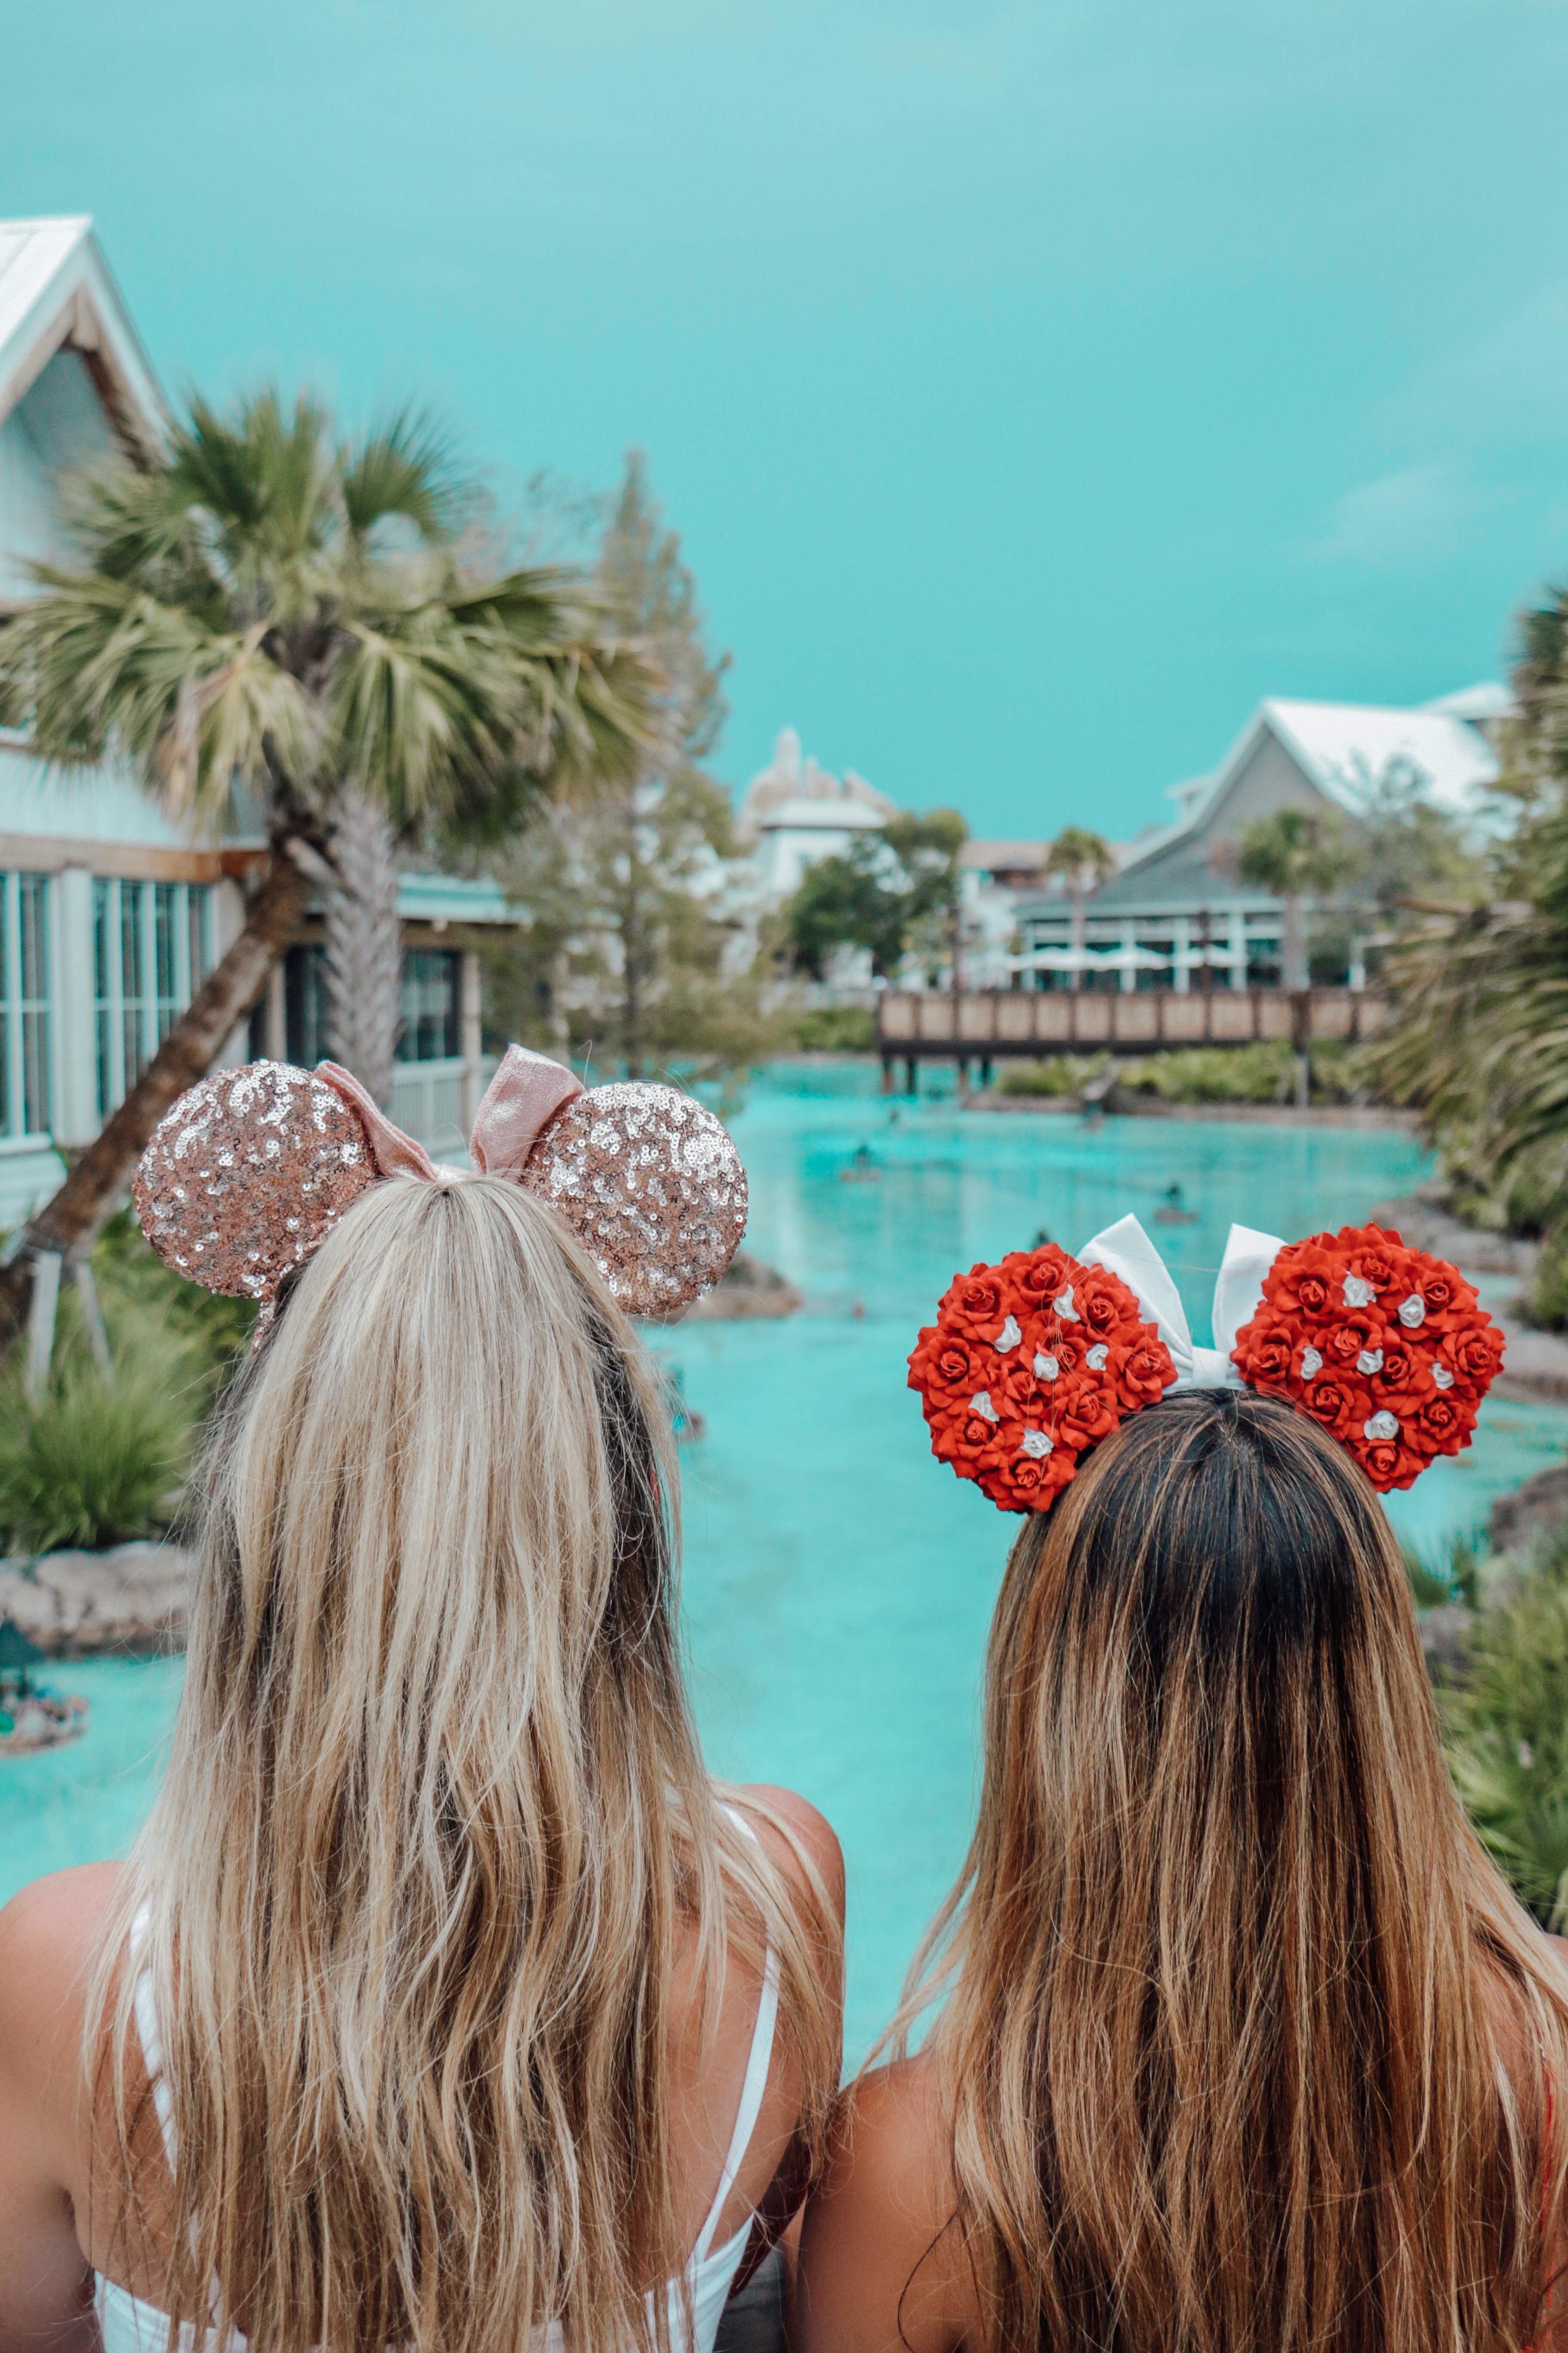 Day Trip to Disney Springs